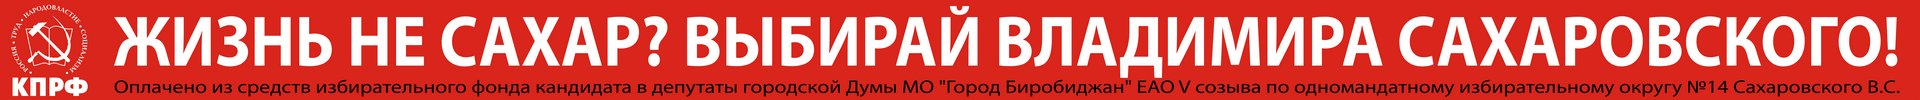 Голосуйте за Владимира Сахаровского